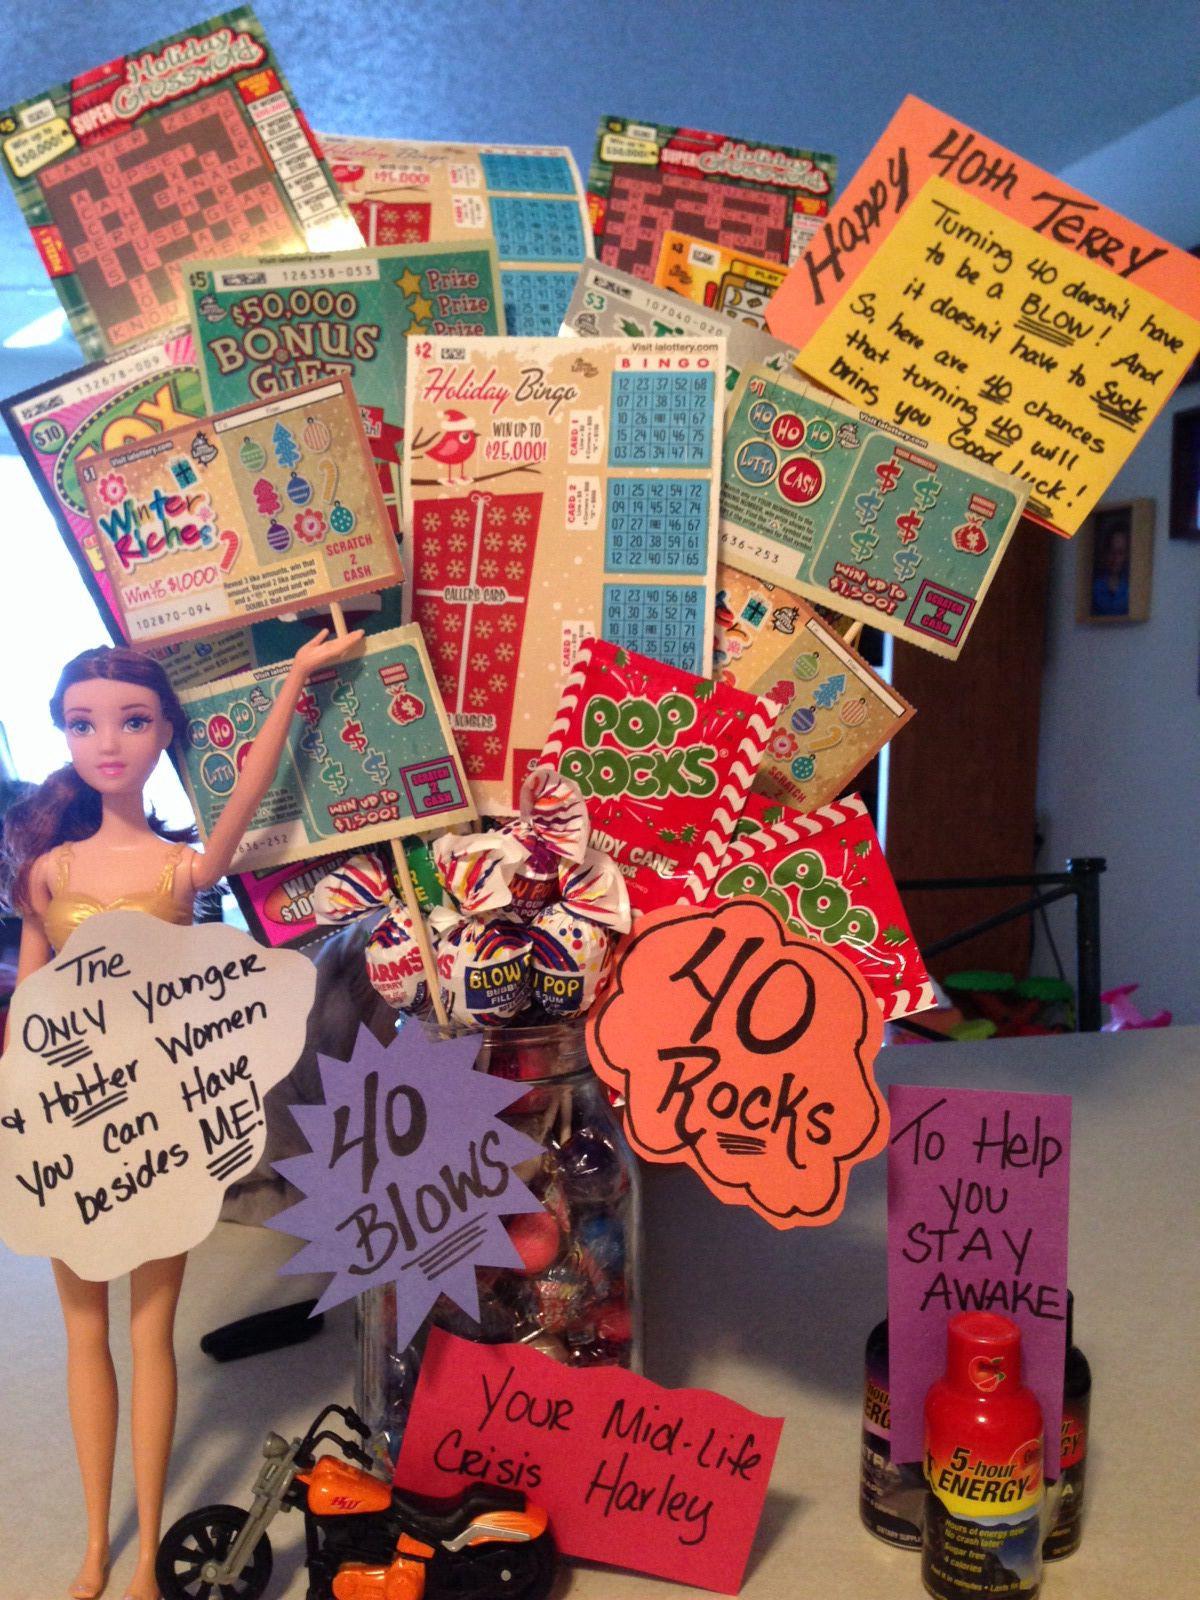 40th birthday gift idea 40th birthday gifts, 40th